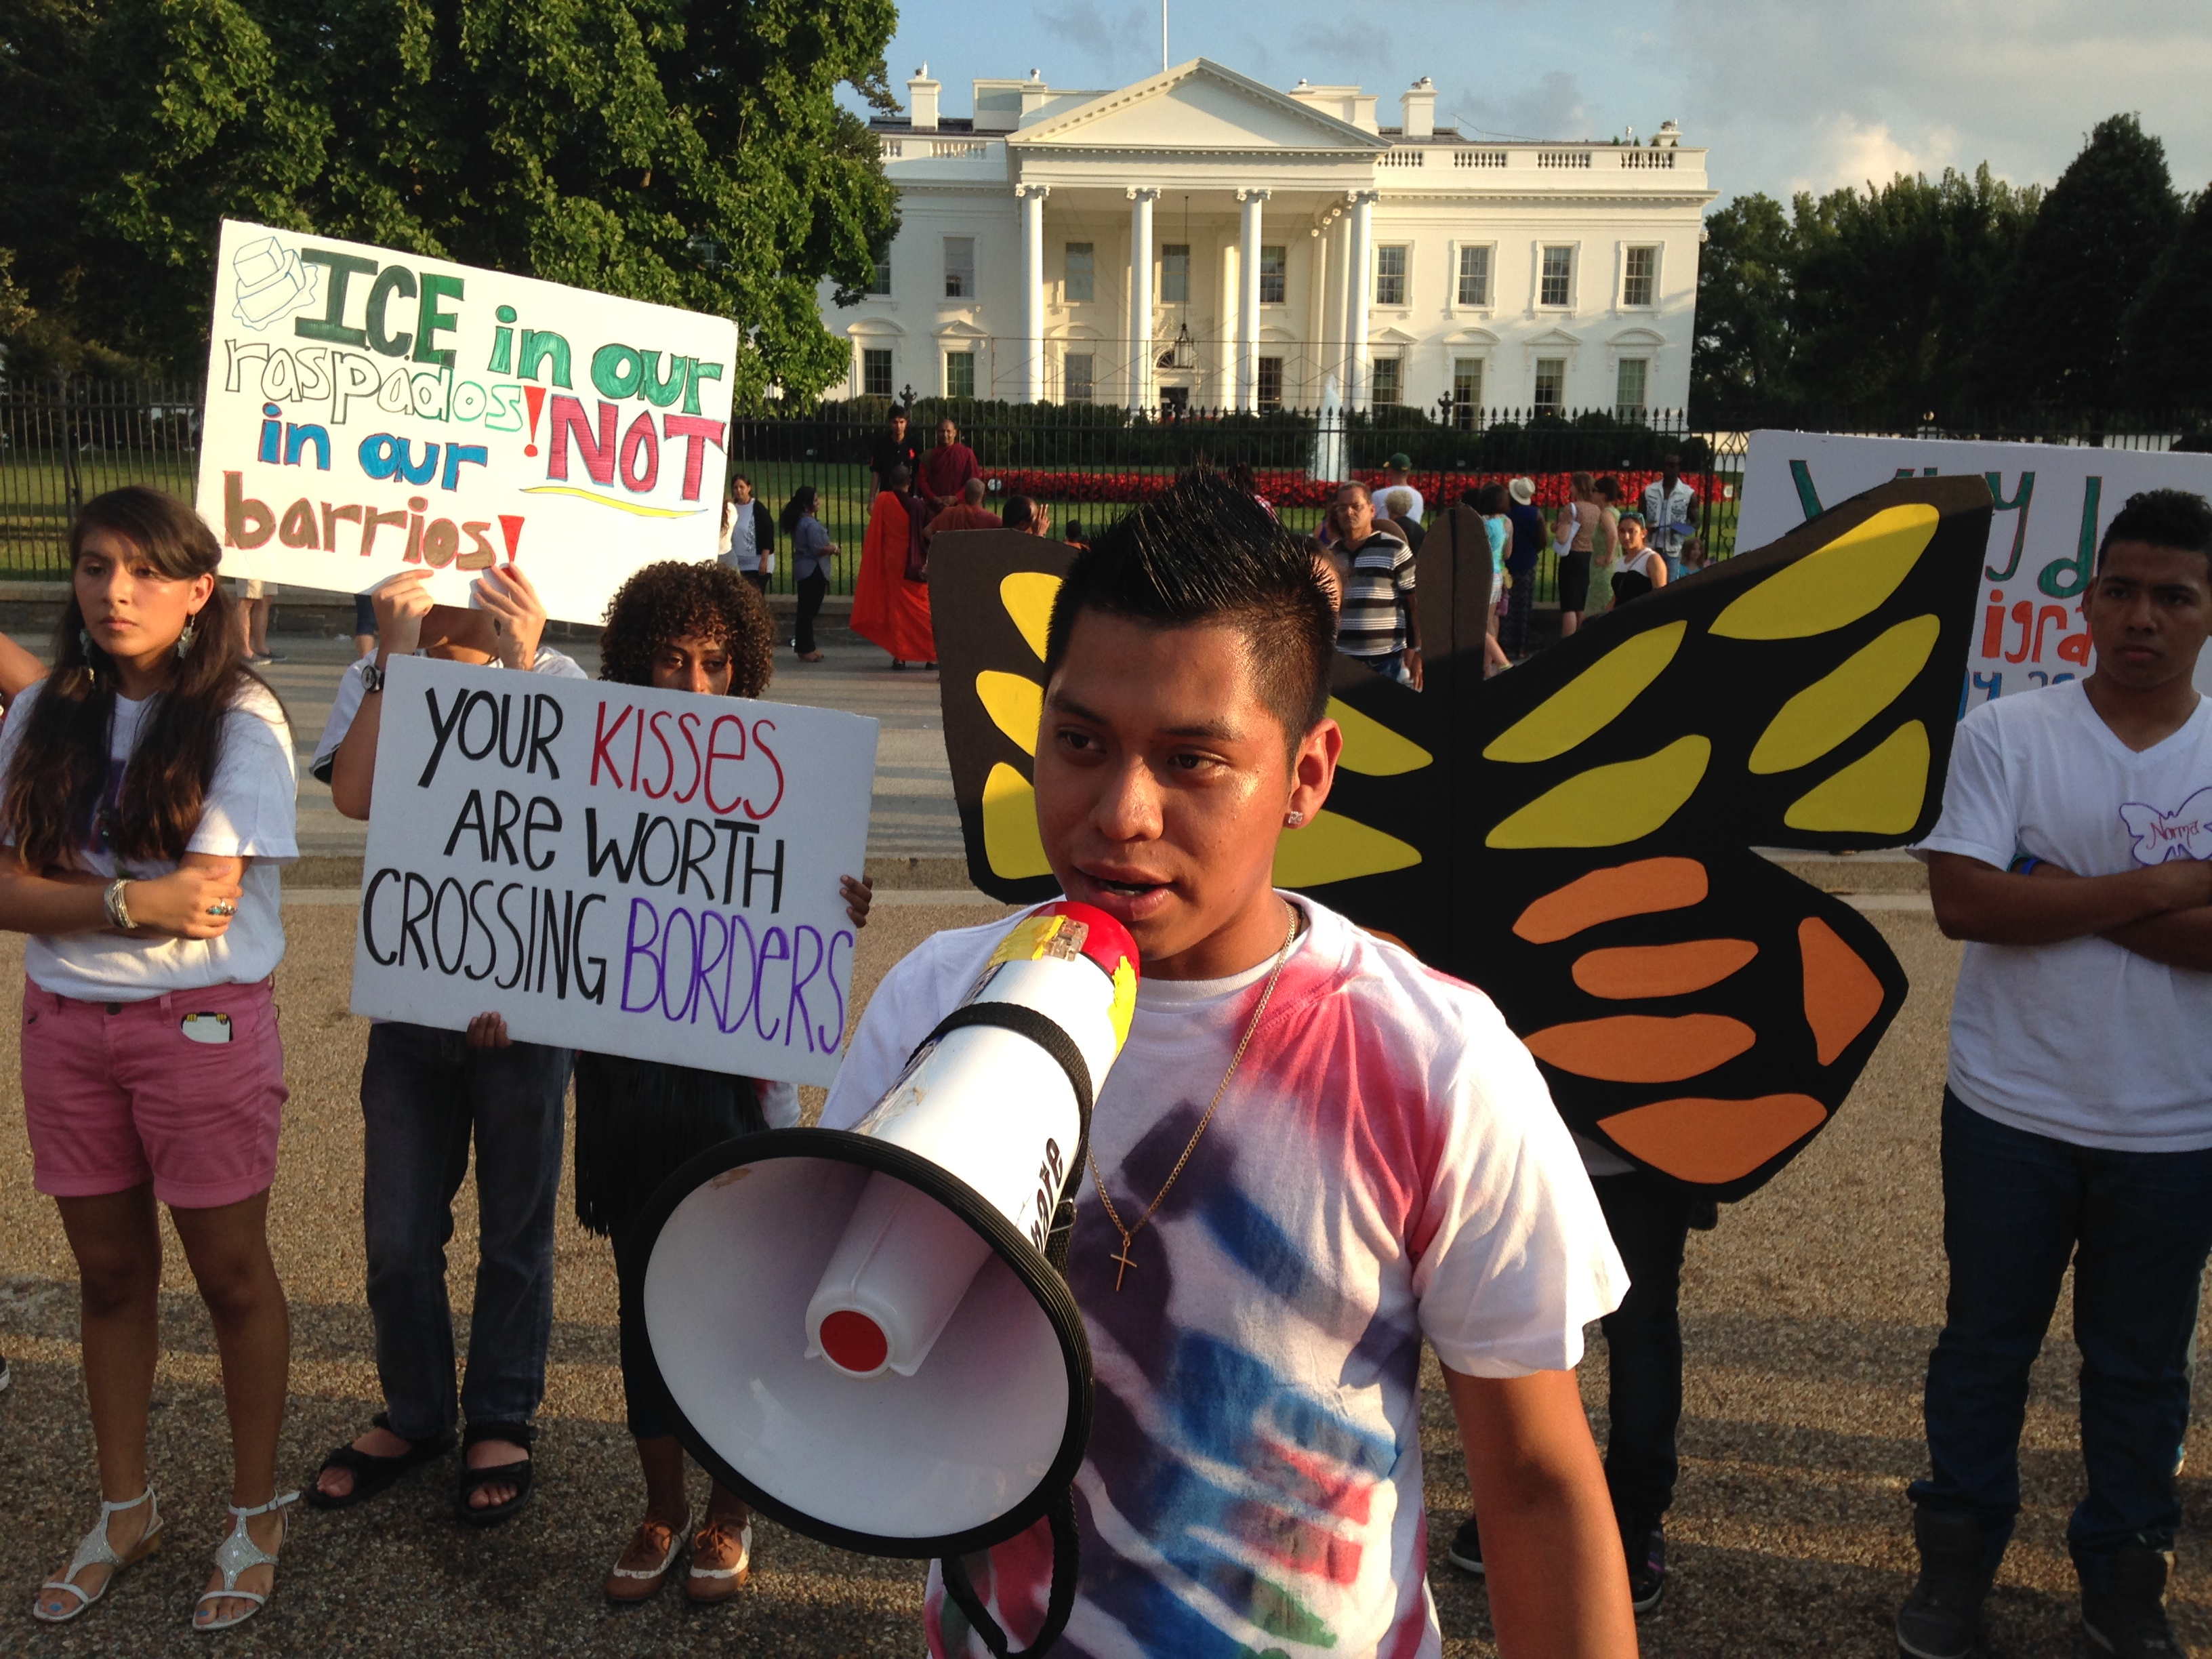 Demonstrators seek better treatment of border kids